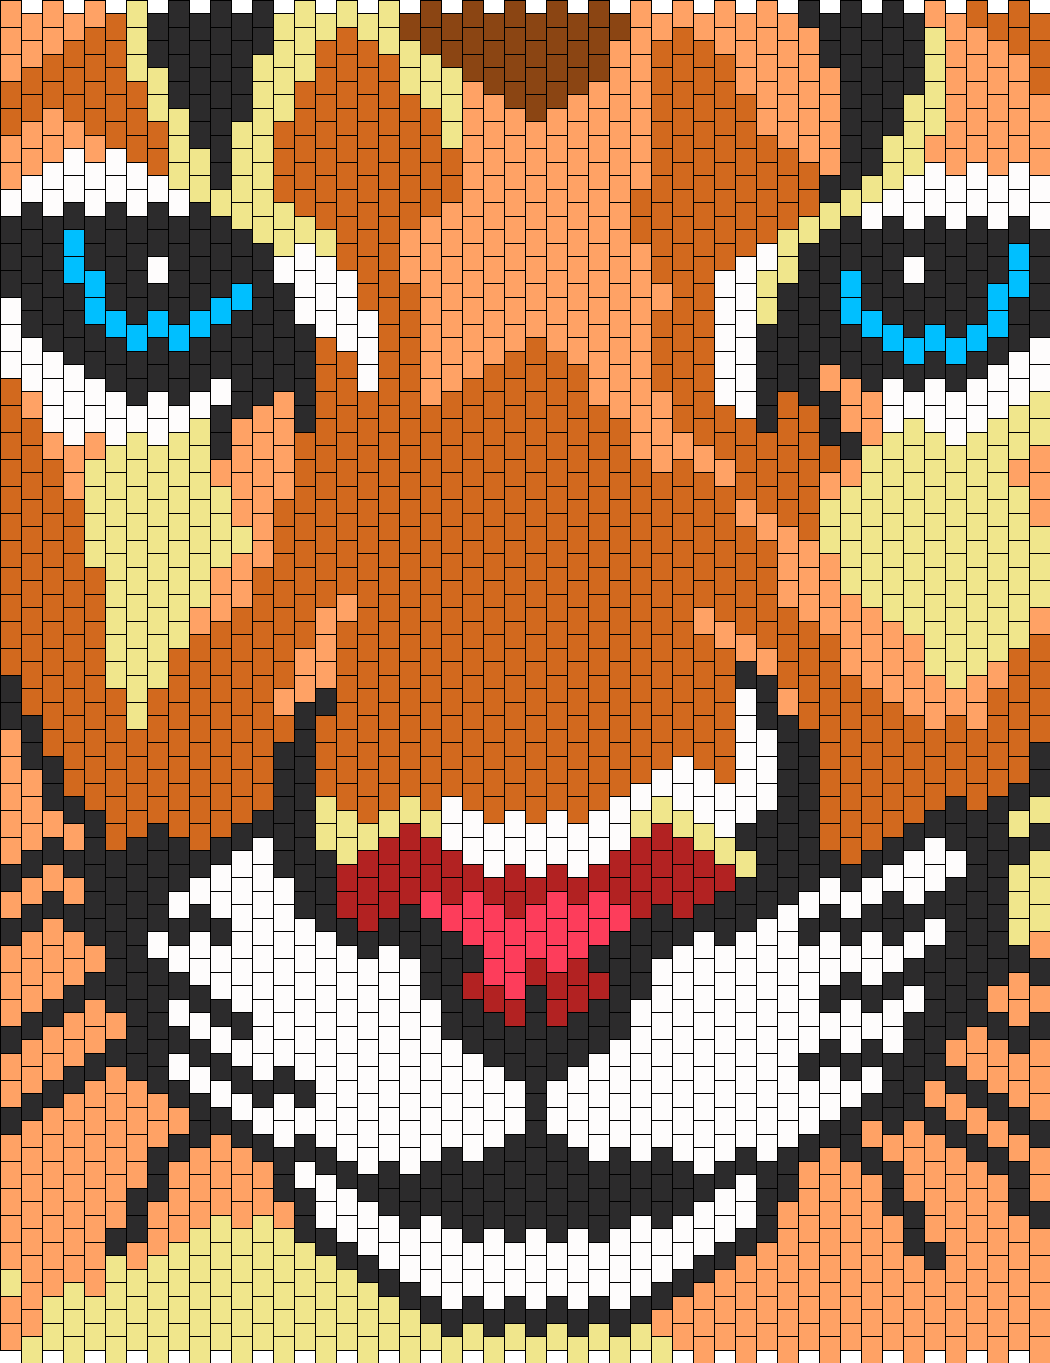 Mountain Lion Bead Pattern Peyote Bead Patterns